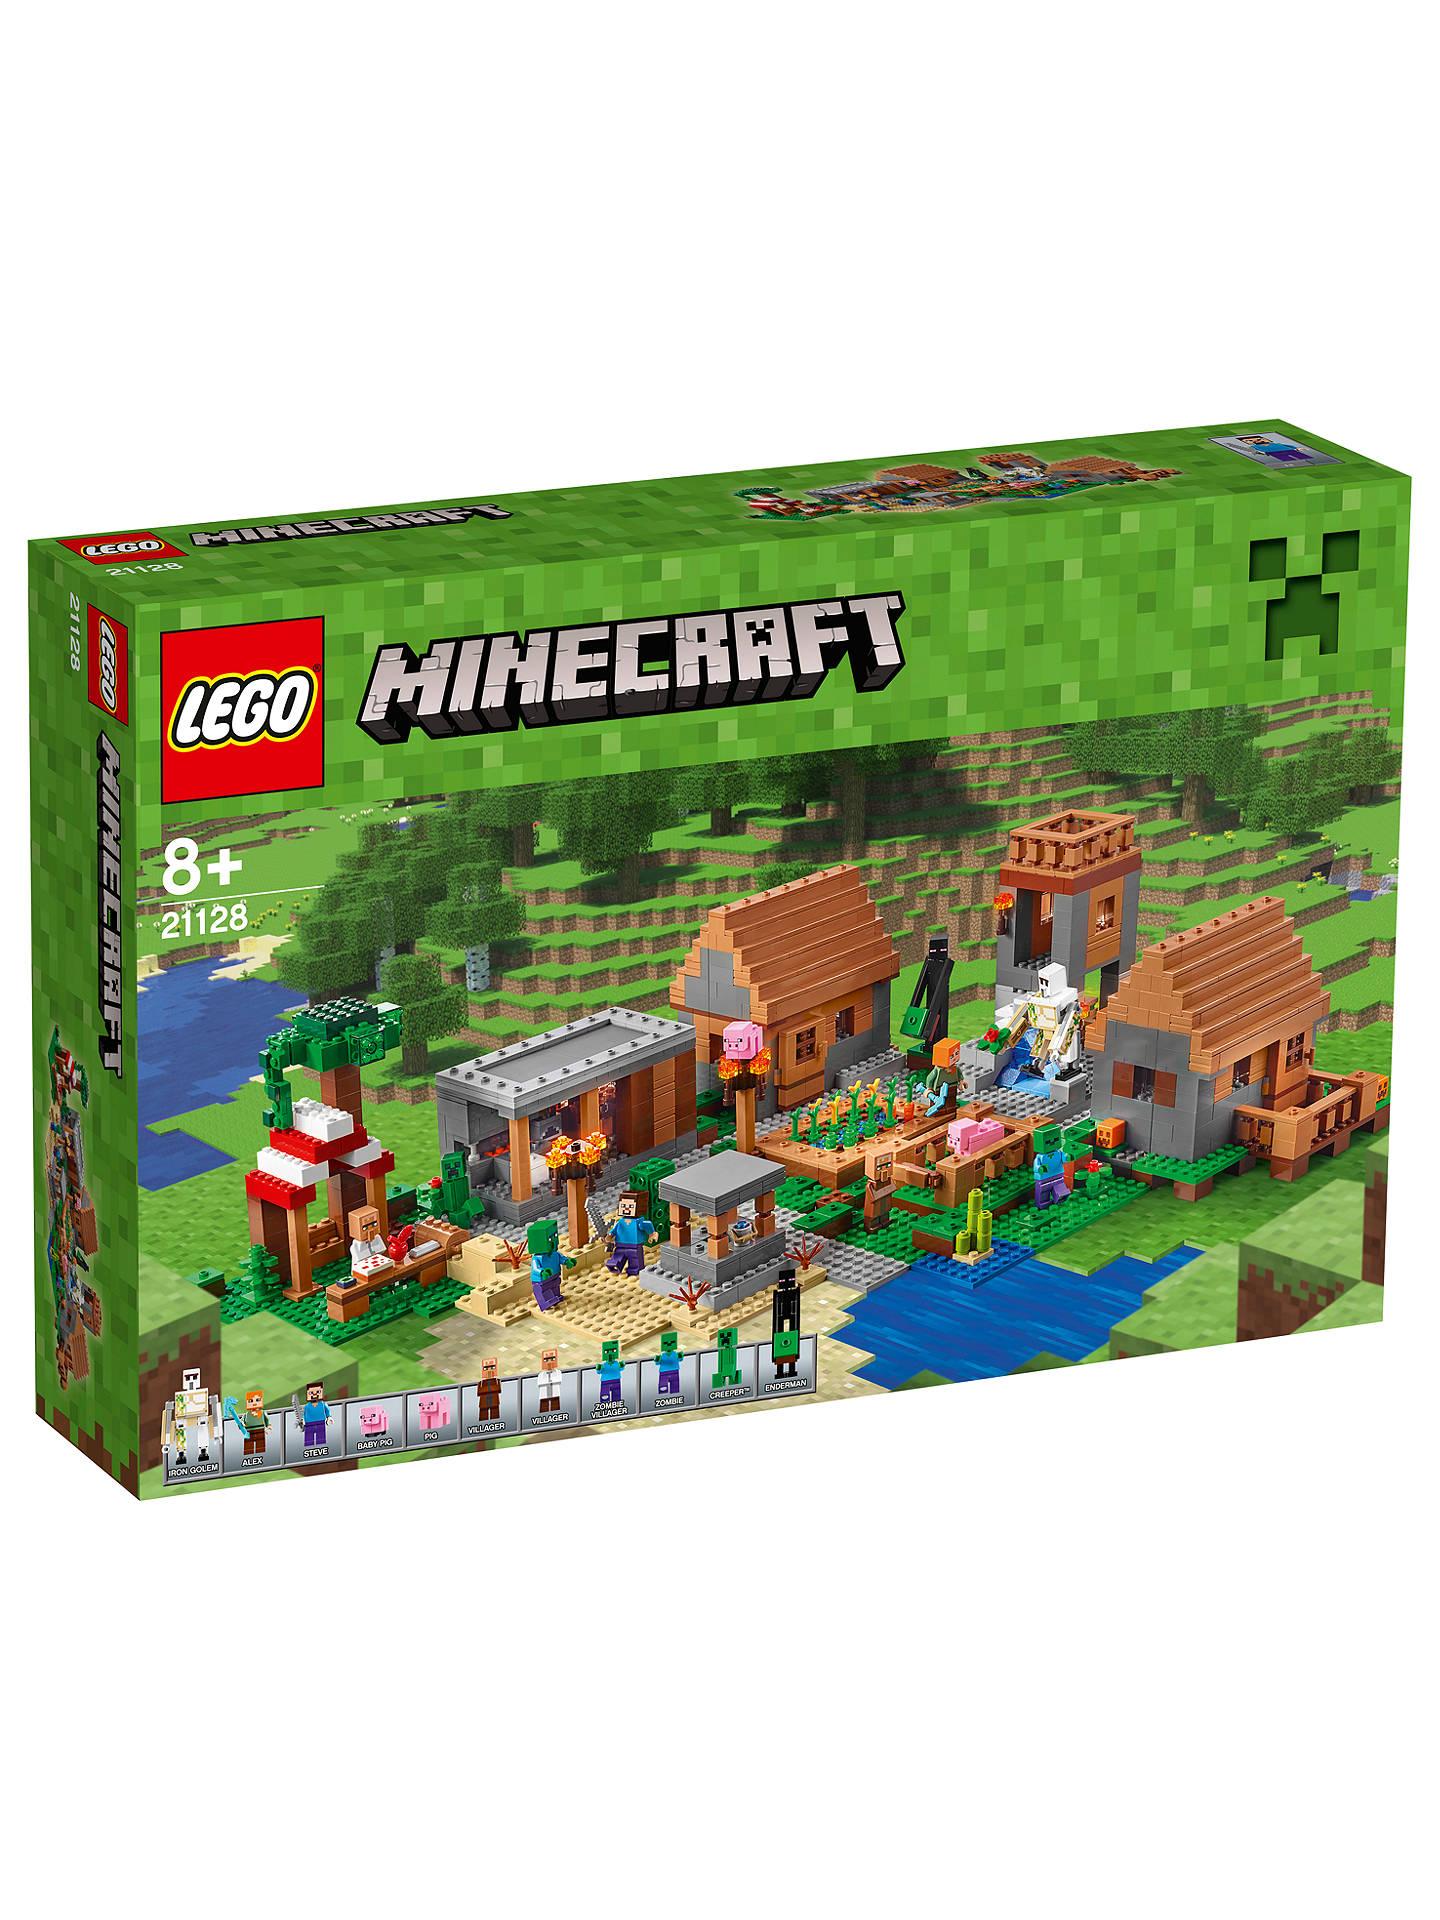 Lego Minecraft The Village At John Lewis Partners